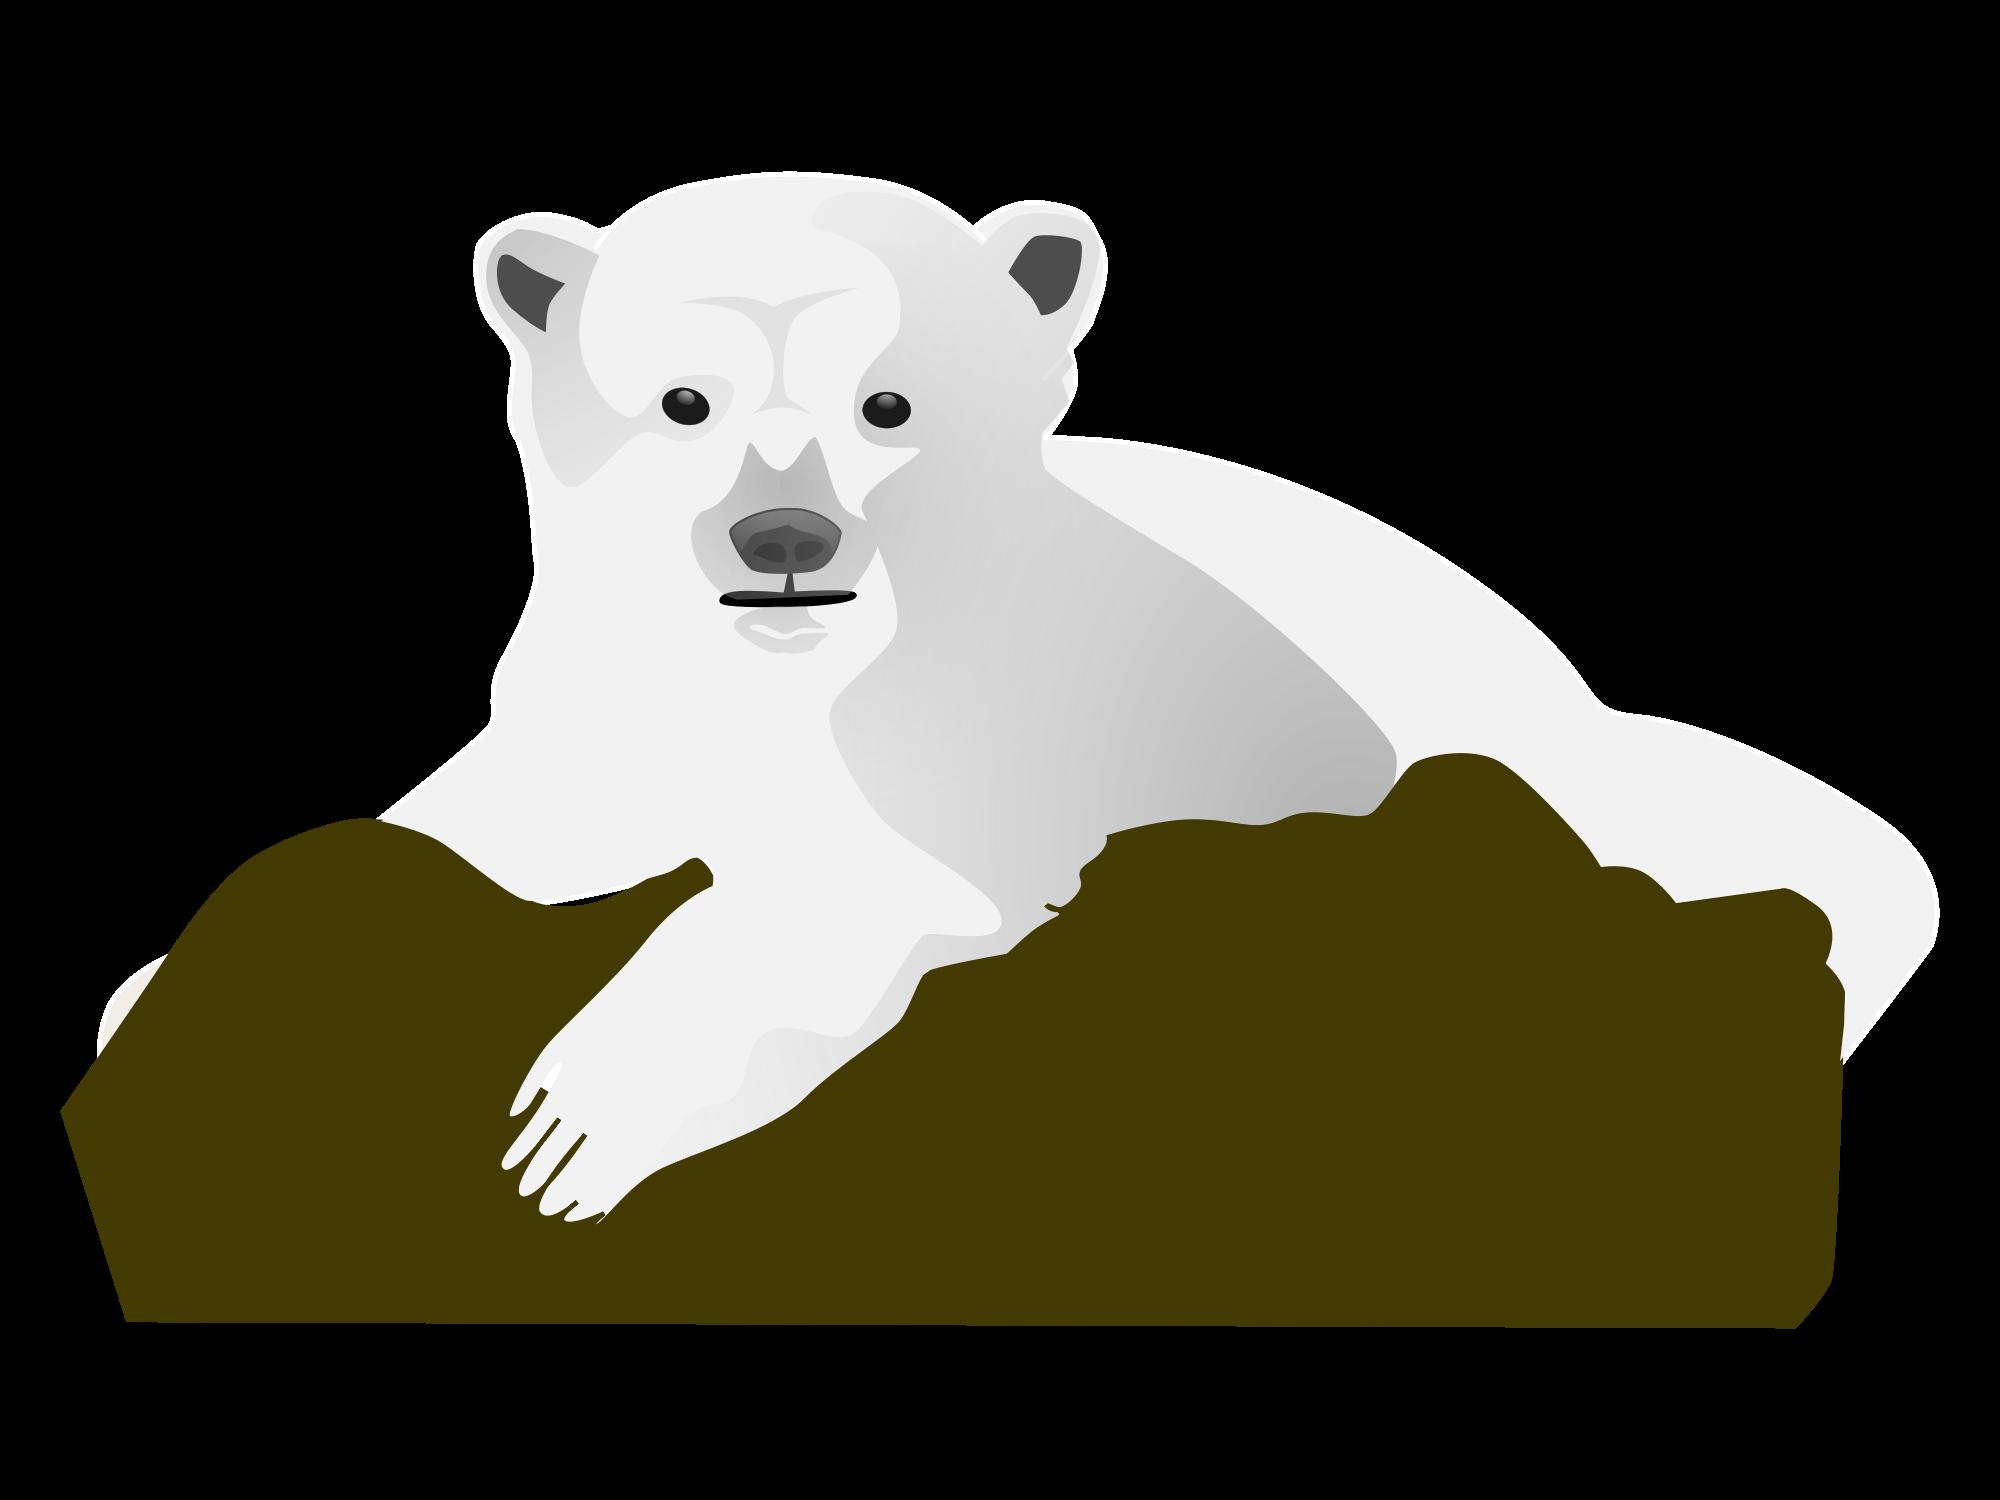 Clipart rock file. Polar bear clip art